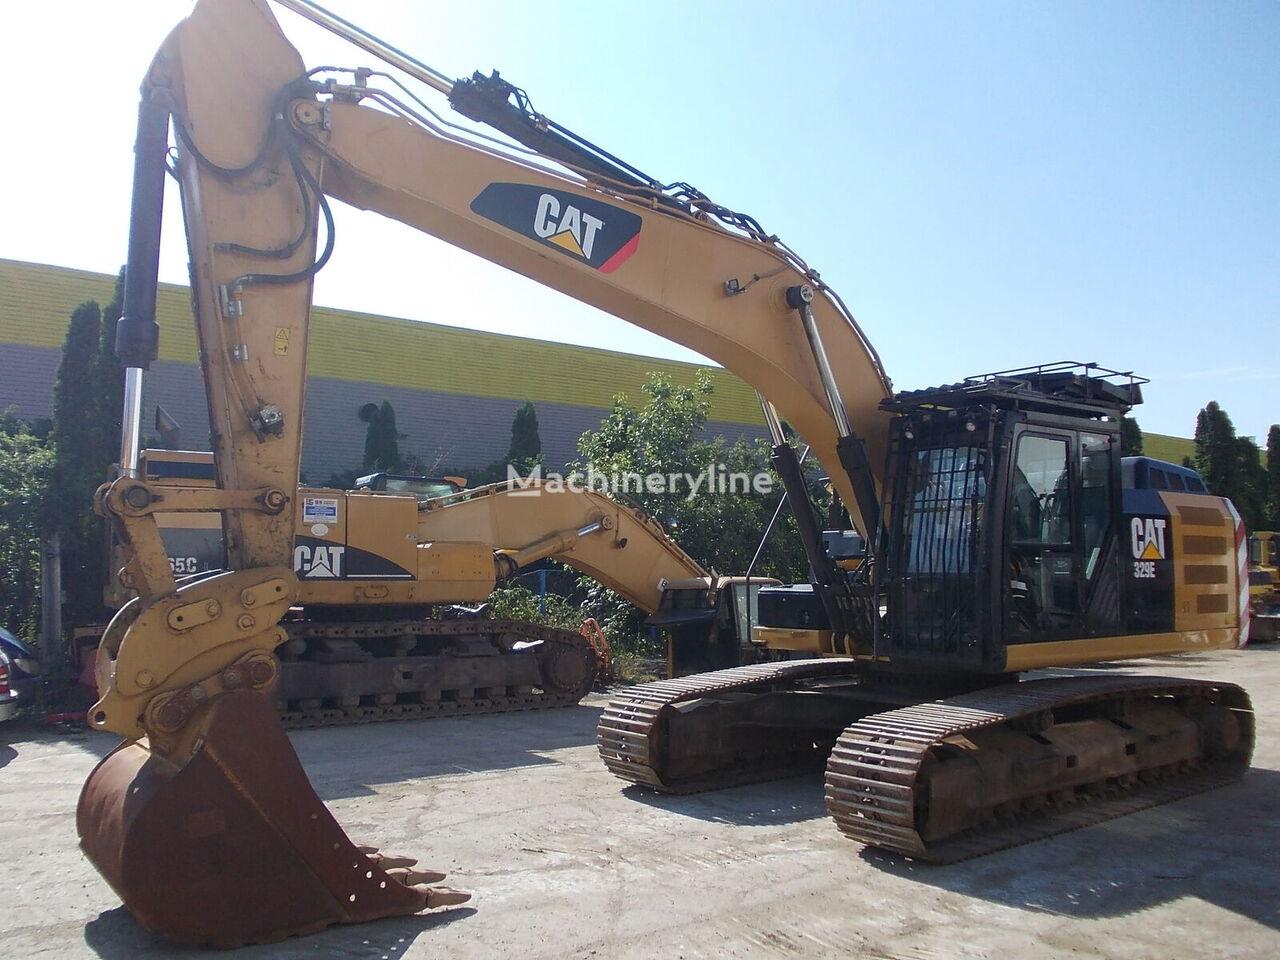 CATERPILLAR 329EL tracked excavator